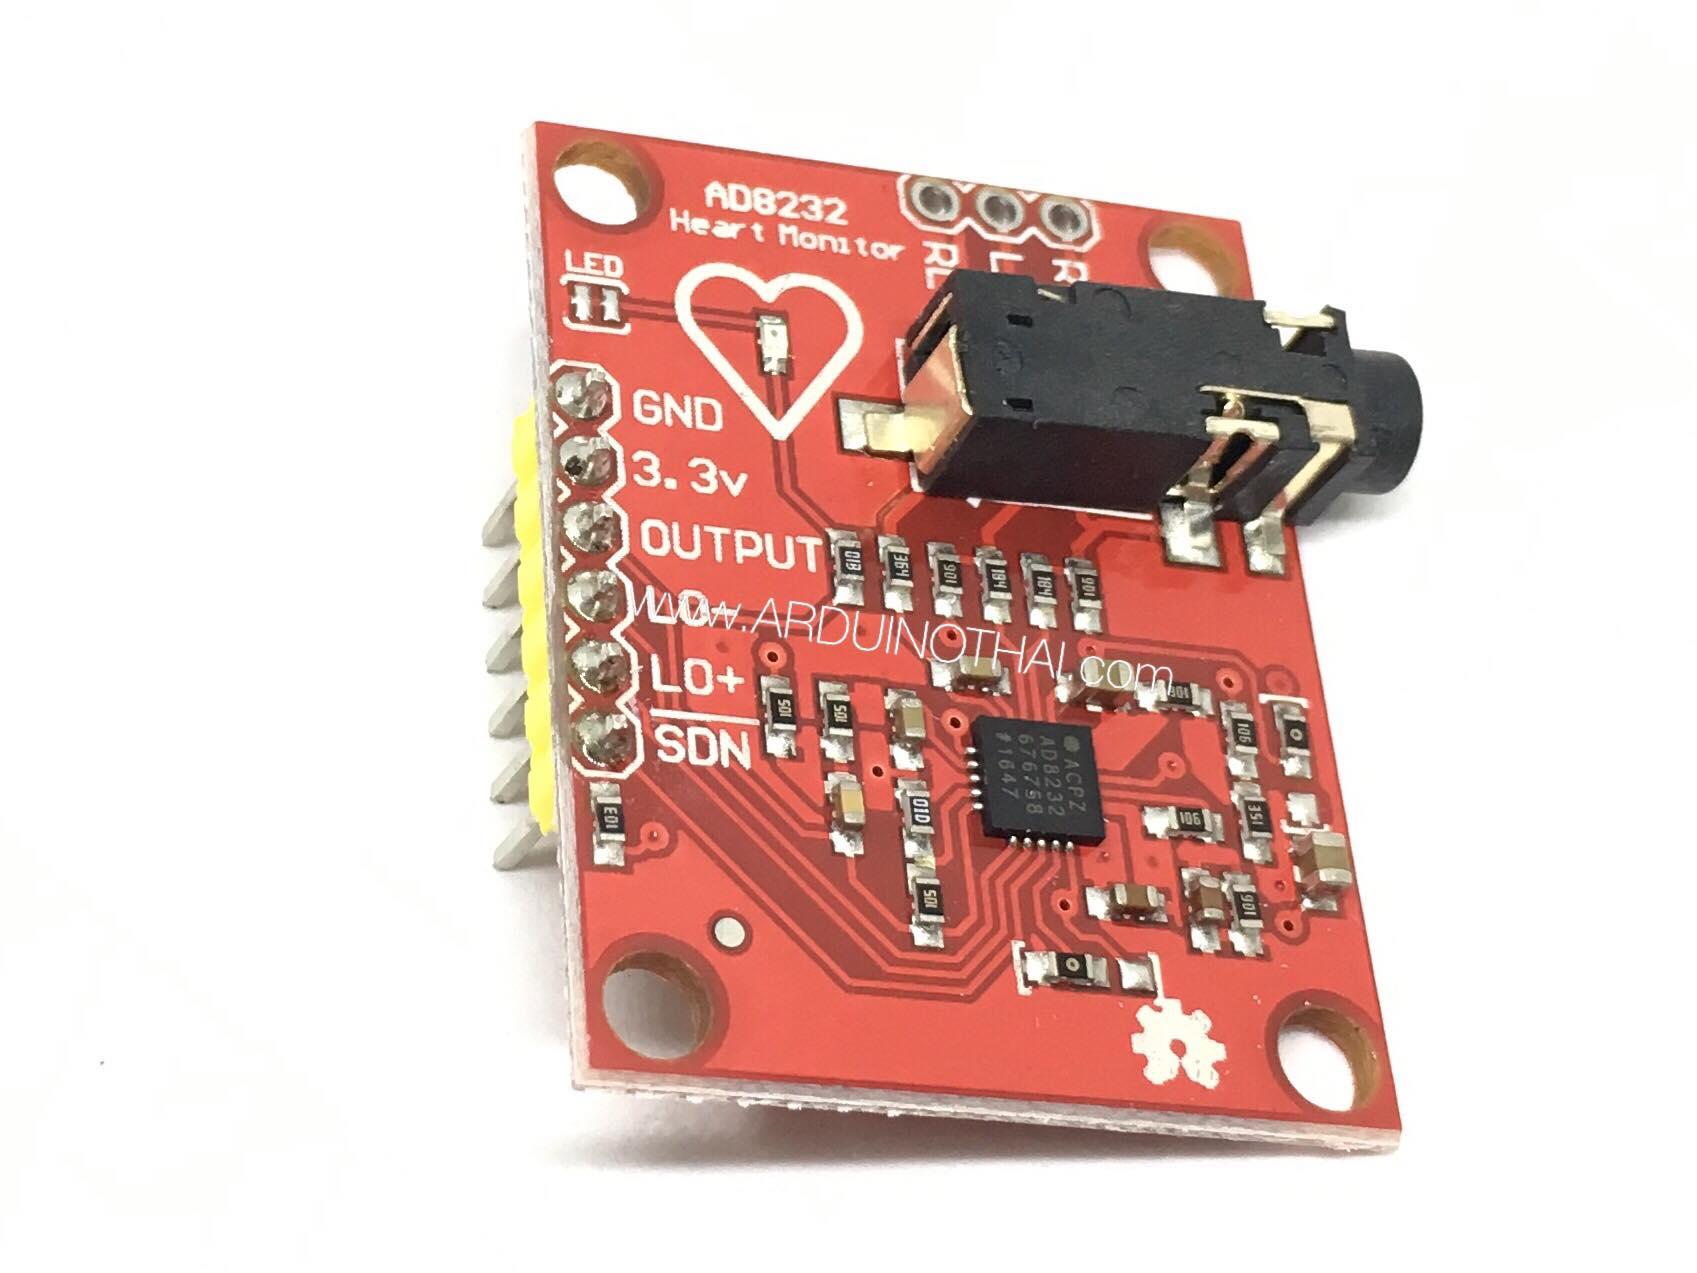 AD8232 ECG Heart Rate module